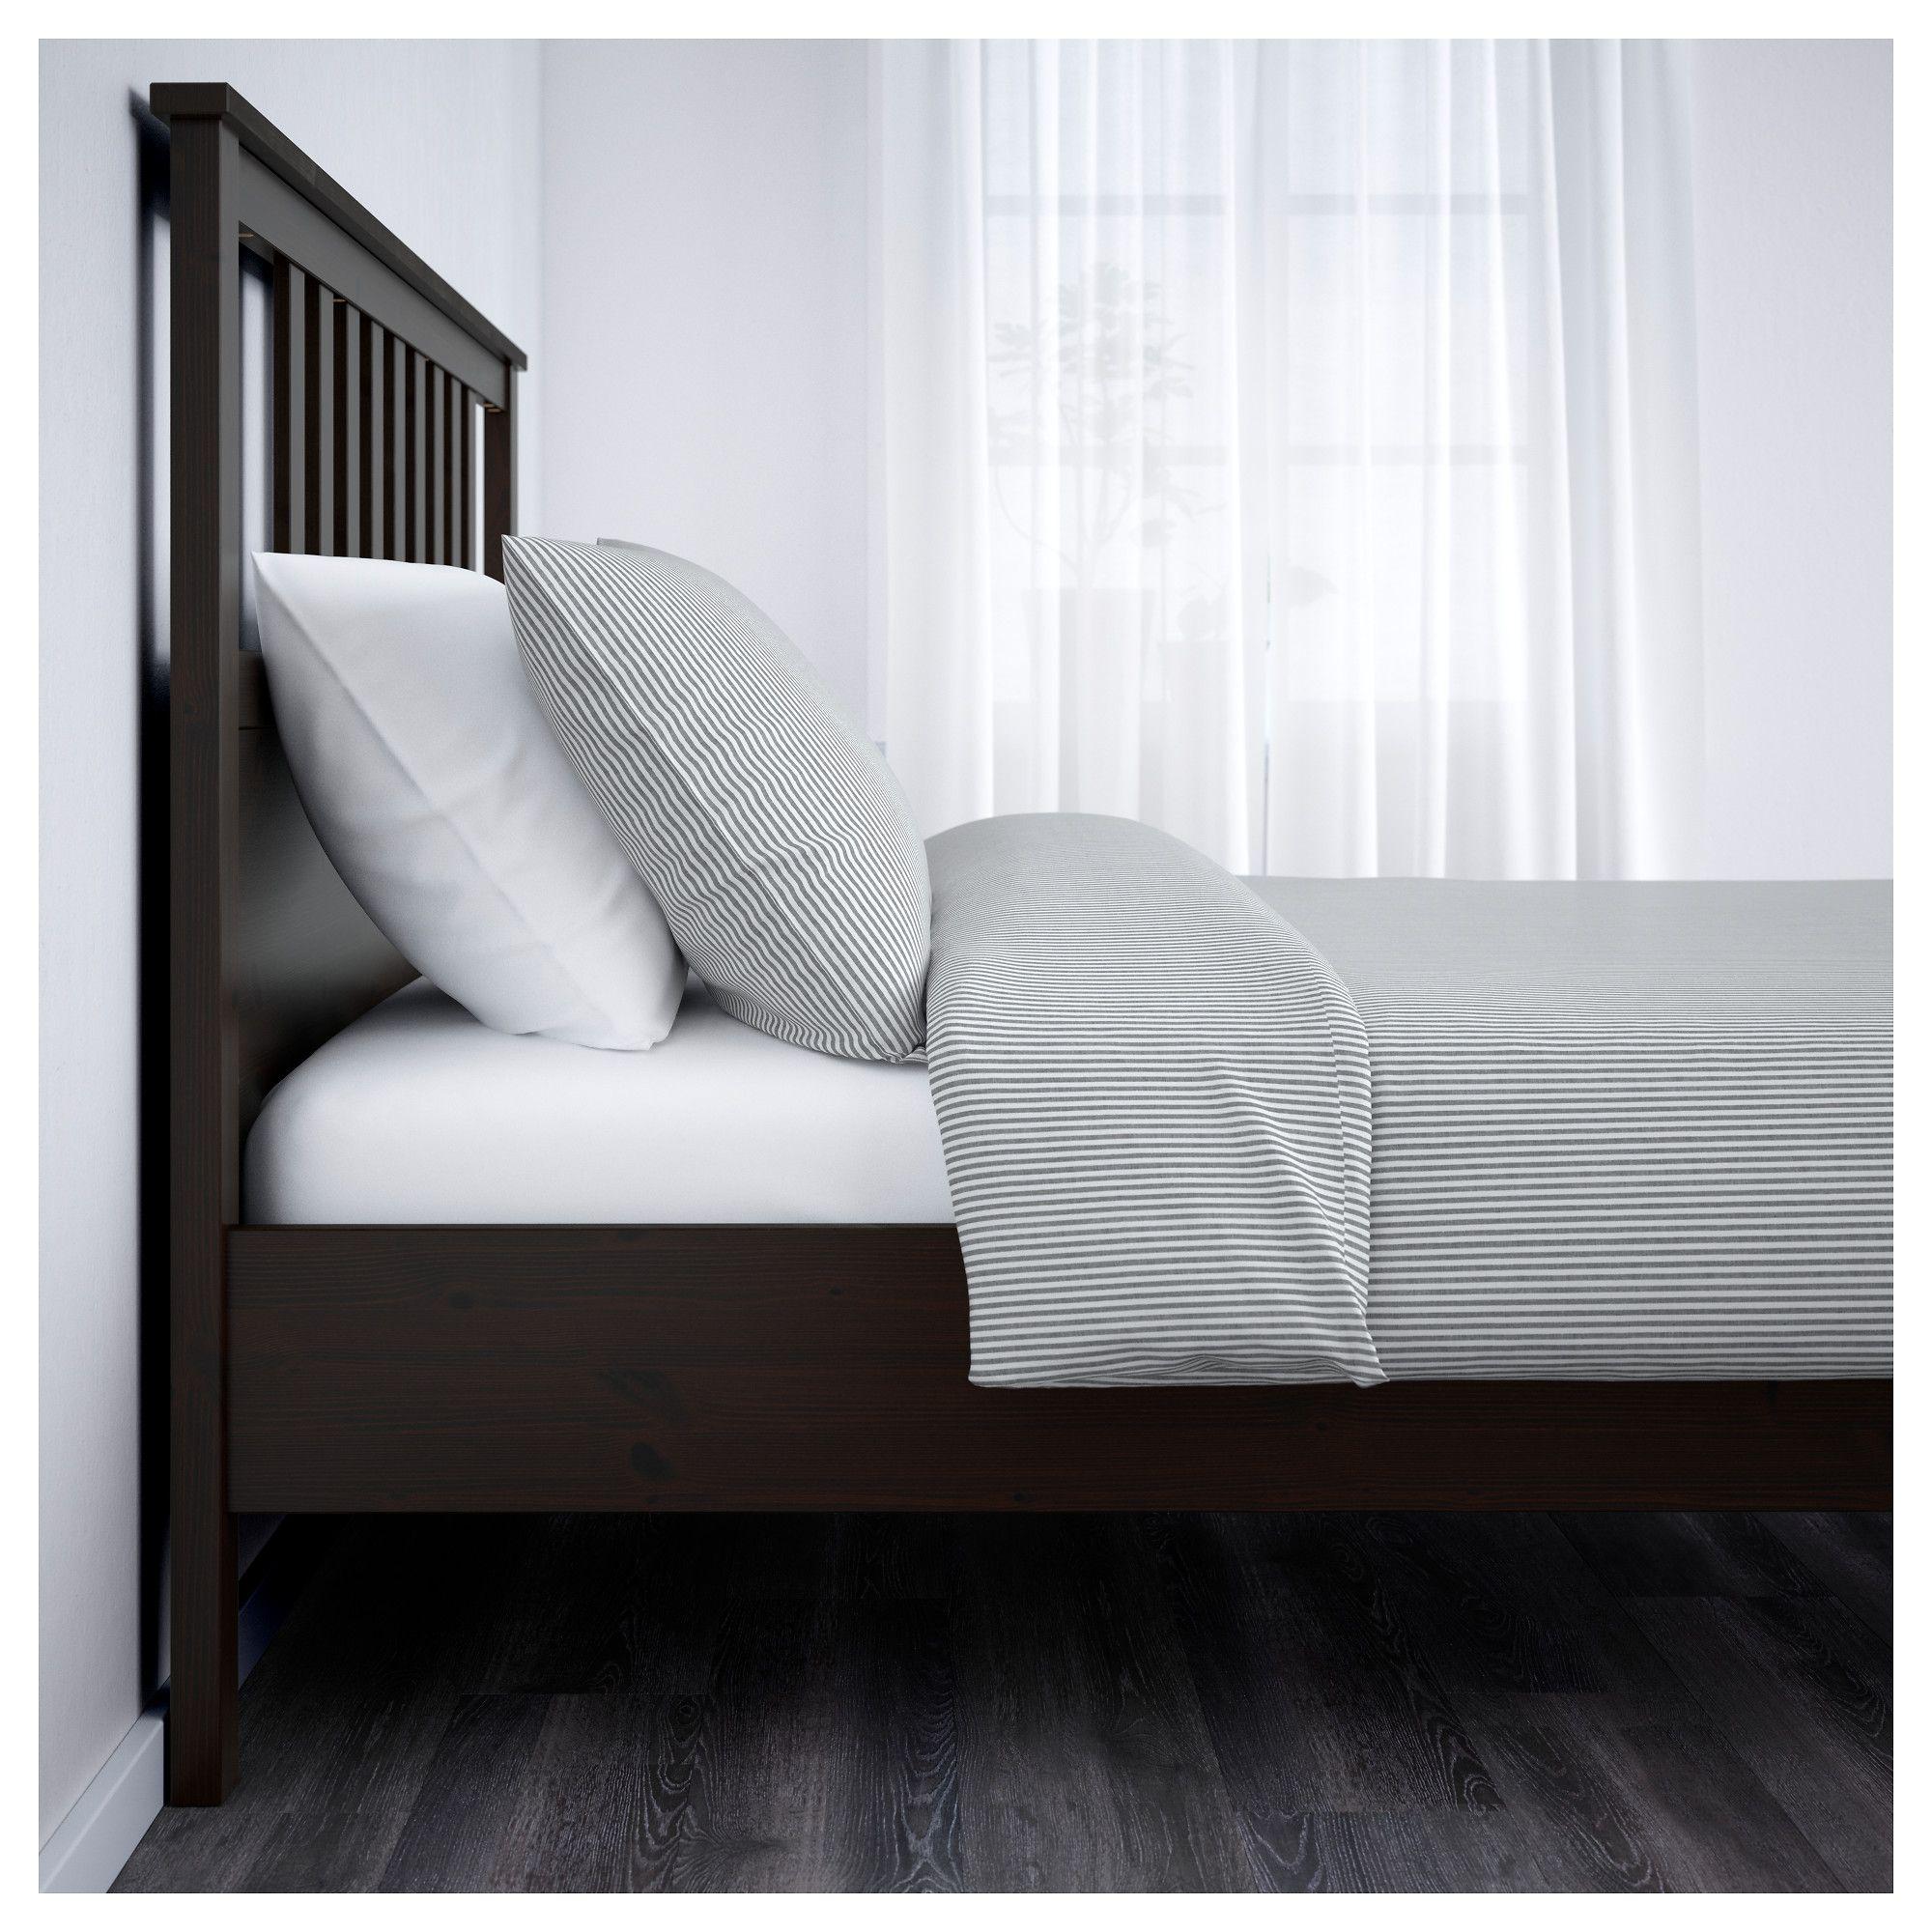 HEMNES Bed frame blackbrown, Leirsund Hemnes bed